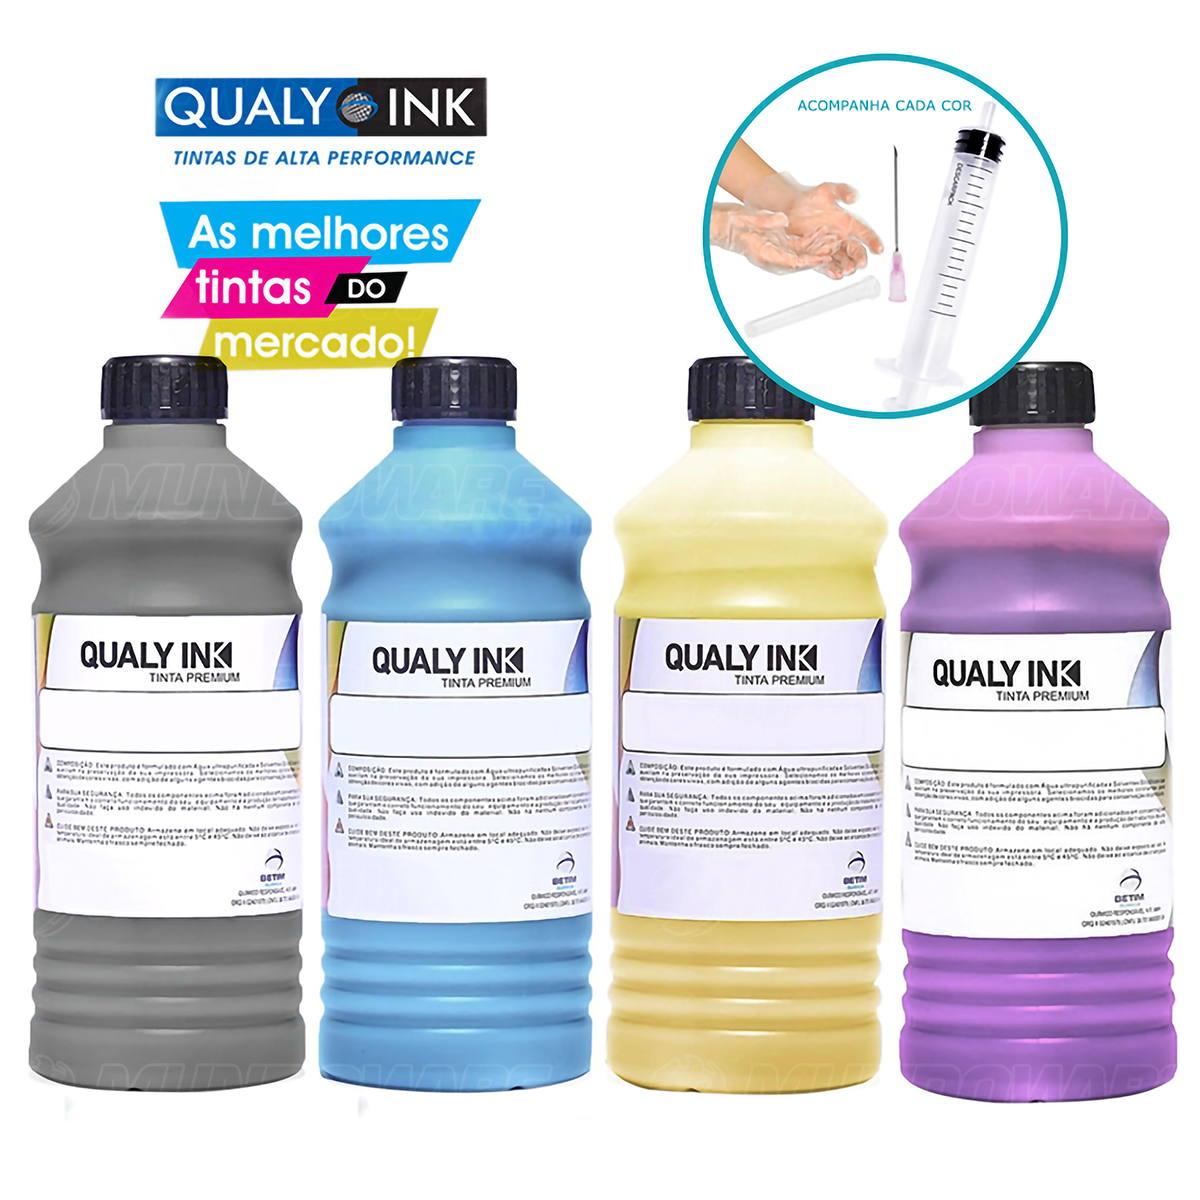 Compatível: Kit 4 Cores Tinta Corante Qualy-Ink para HP GT5822 GT5820 GT5810 GT51 GT52 InkTank 316 416 CMYK 4 de 1L